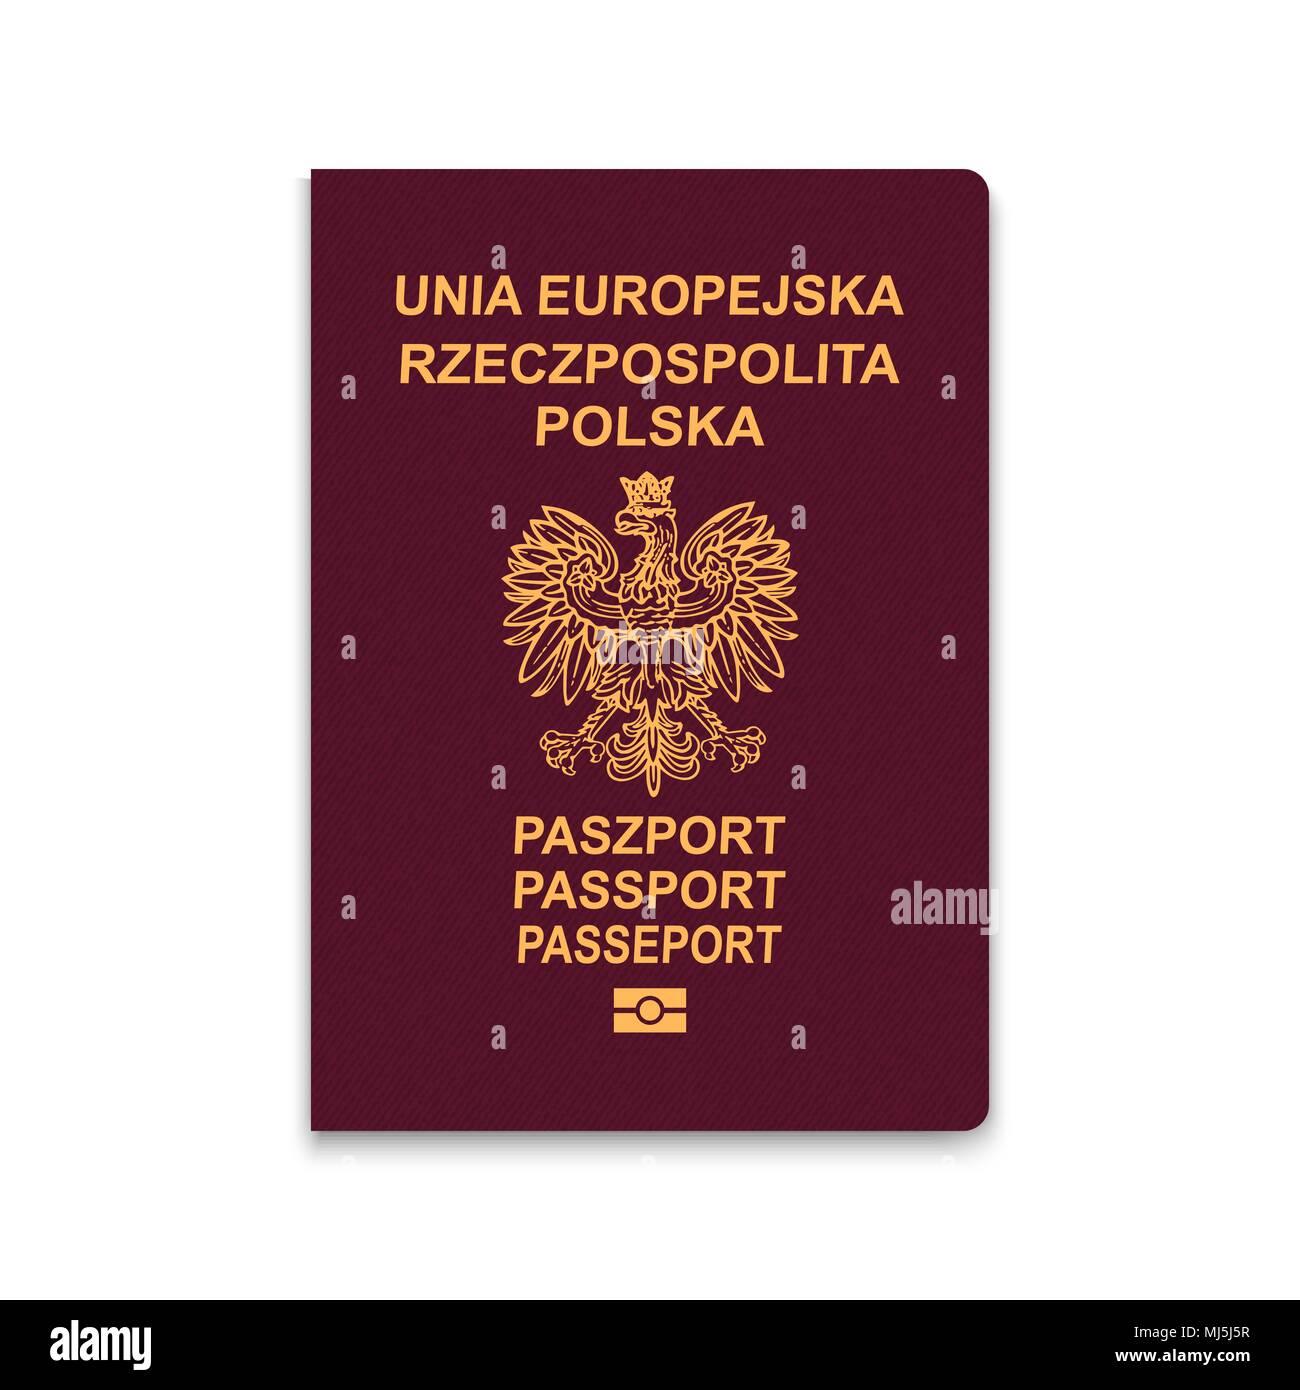 Passport of Poland. Vector illustration - Stock Image